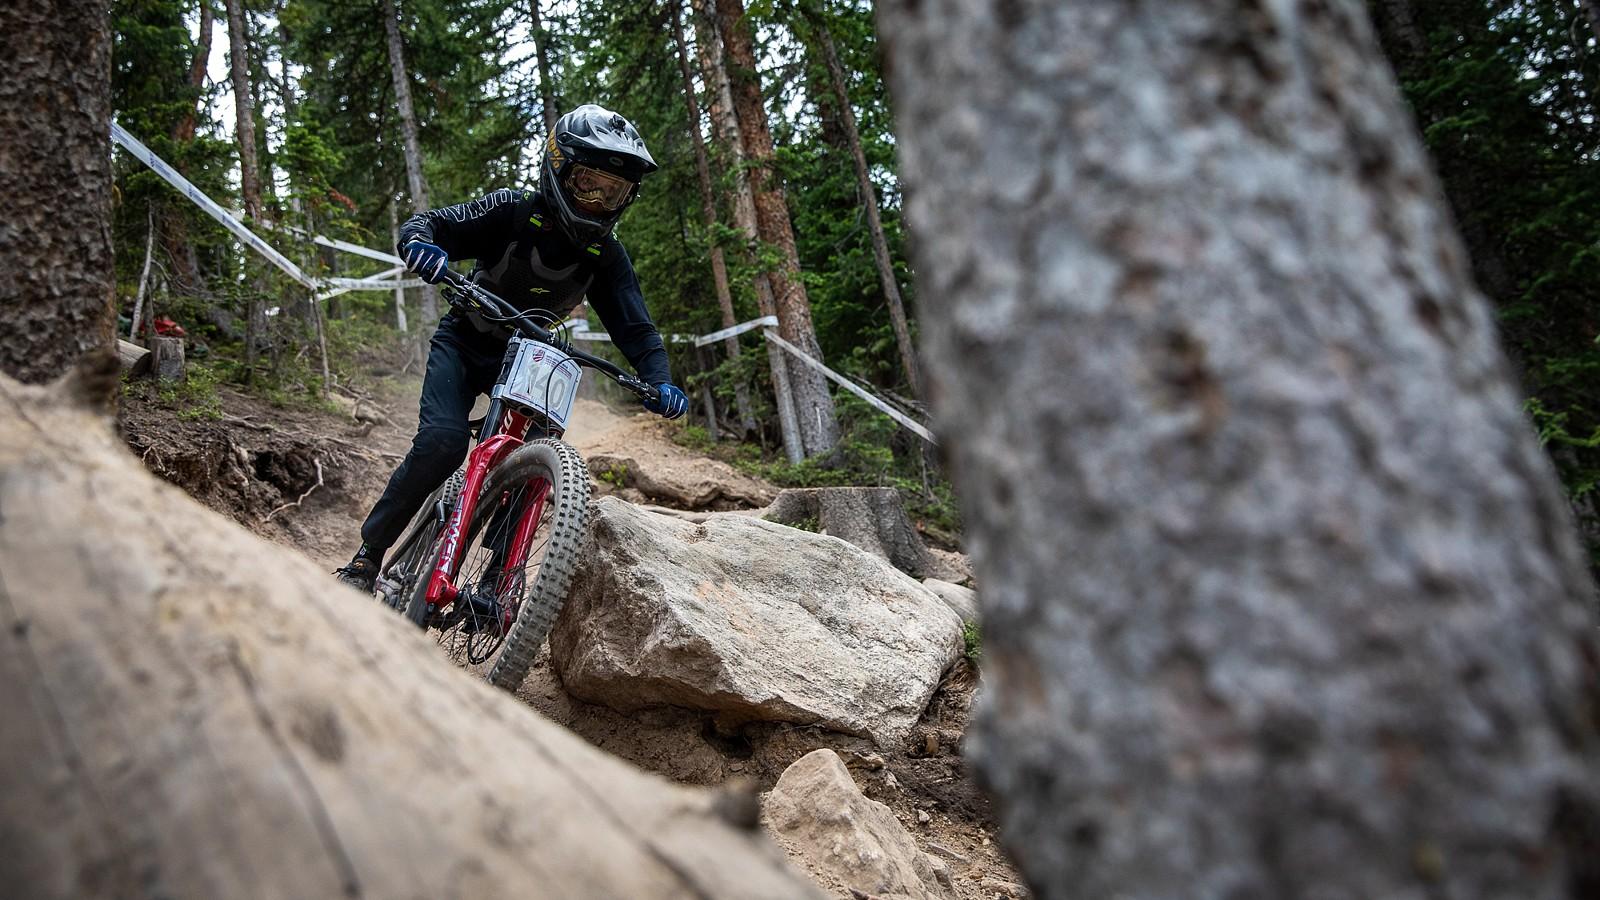 Bodie Heflin - US National Champs Downhill Photo Blast - Mountain Biking Pictures - Vital MTB